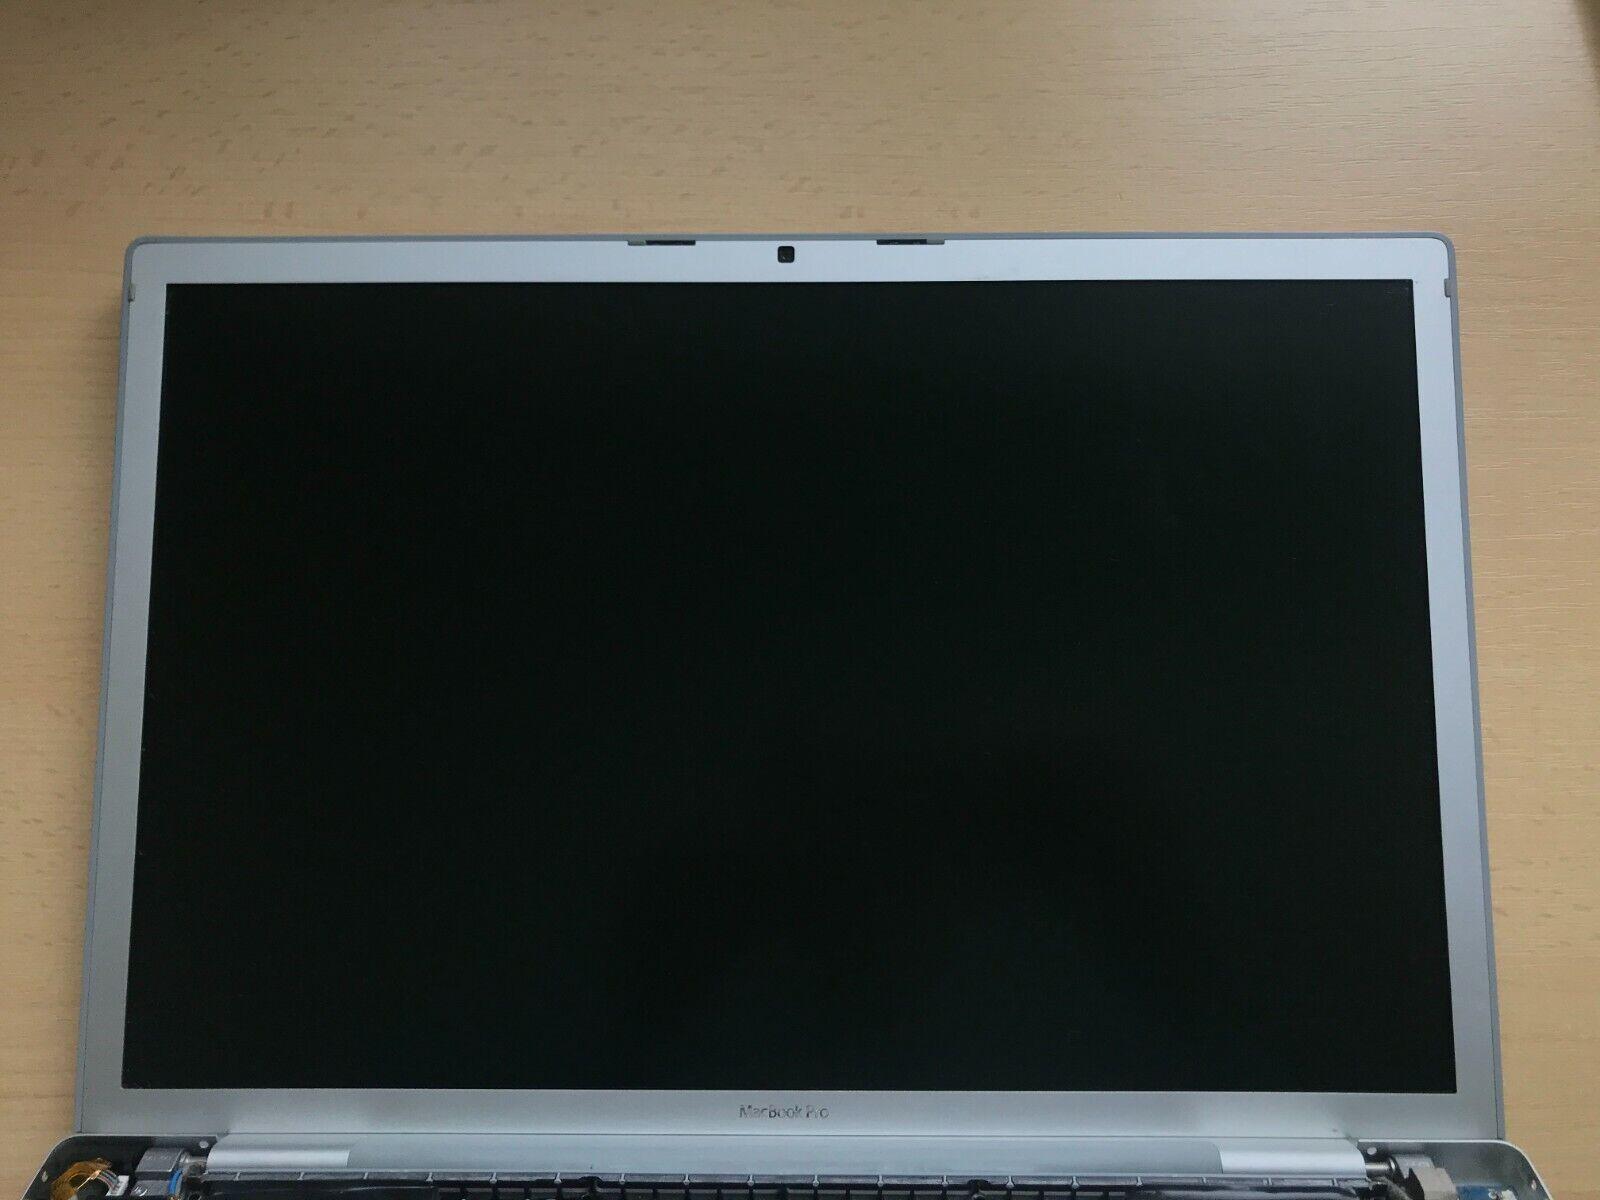 Apple MacBook PRO A1226 A1260 2007 2008 15 LCD SCREEN DISPLAY FULL Upper Case